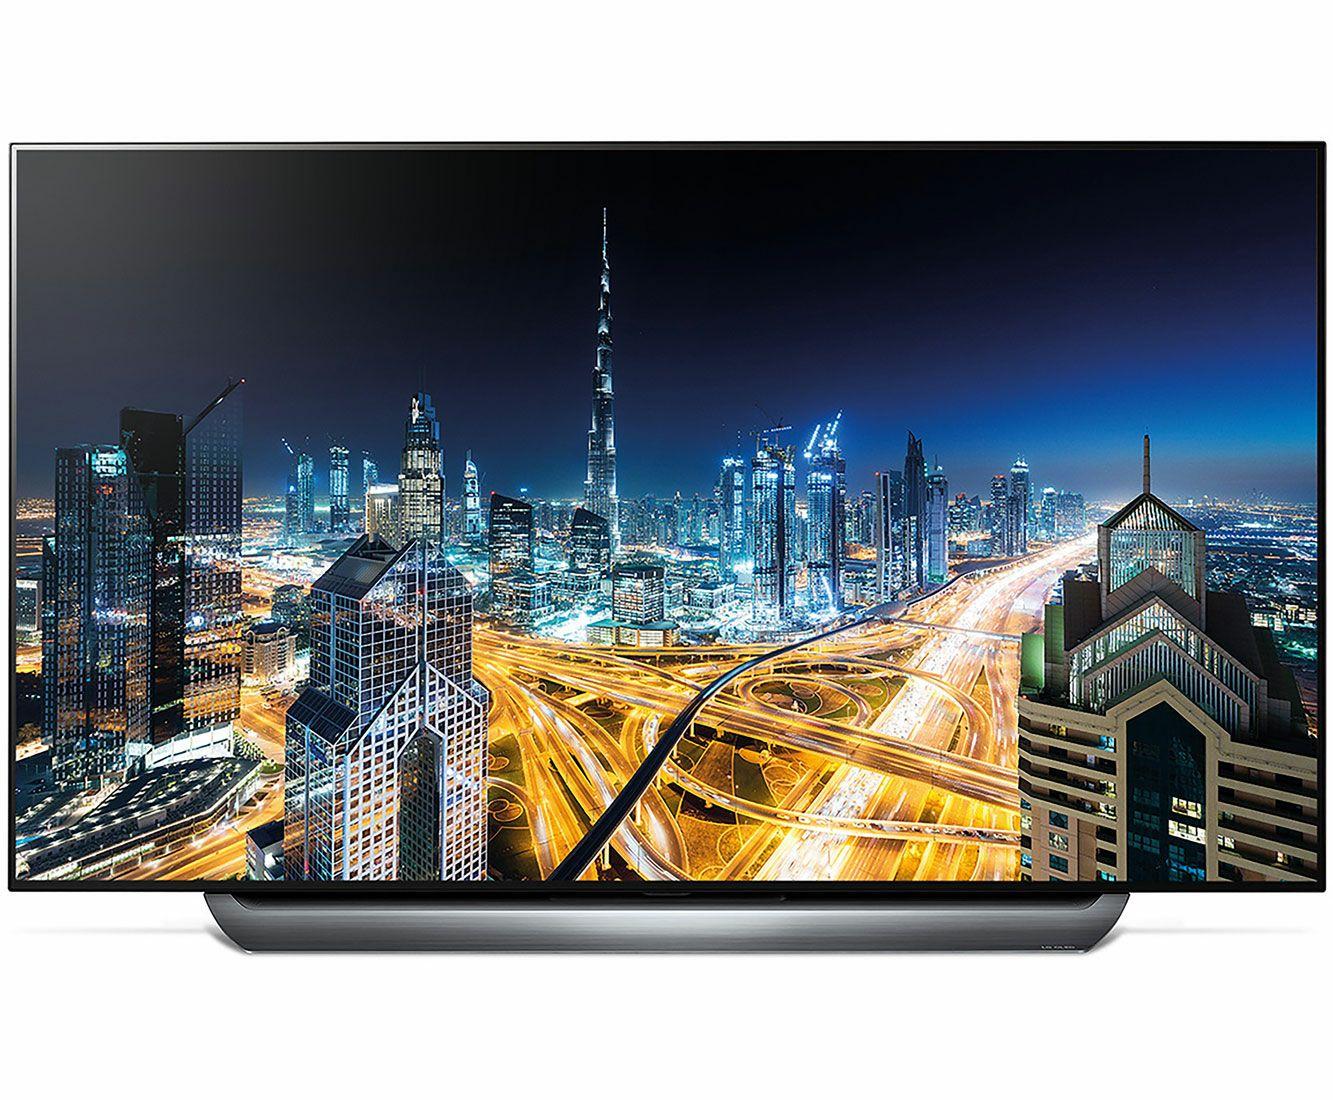 LG OLED 65C8LLA für 1550€